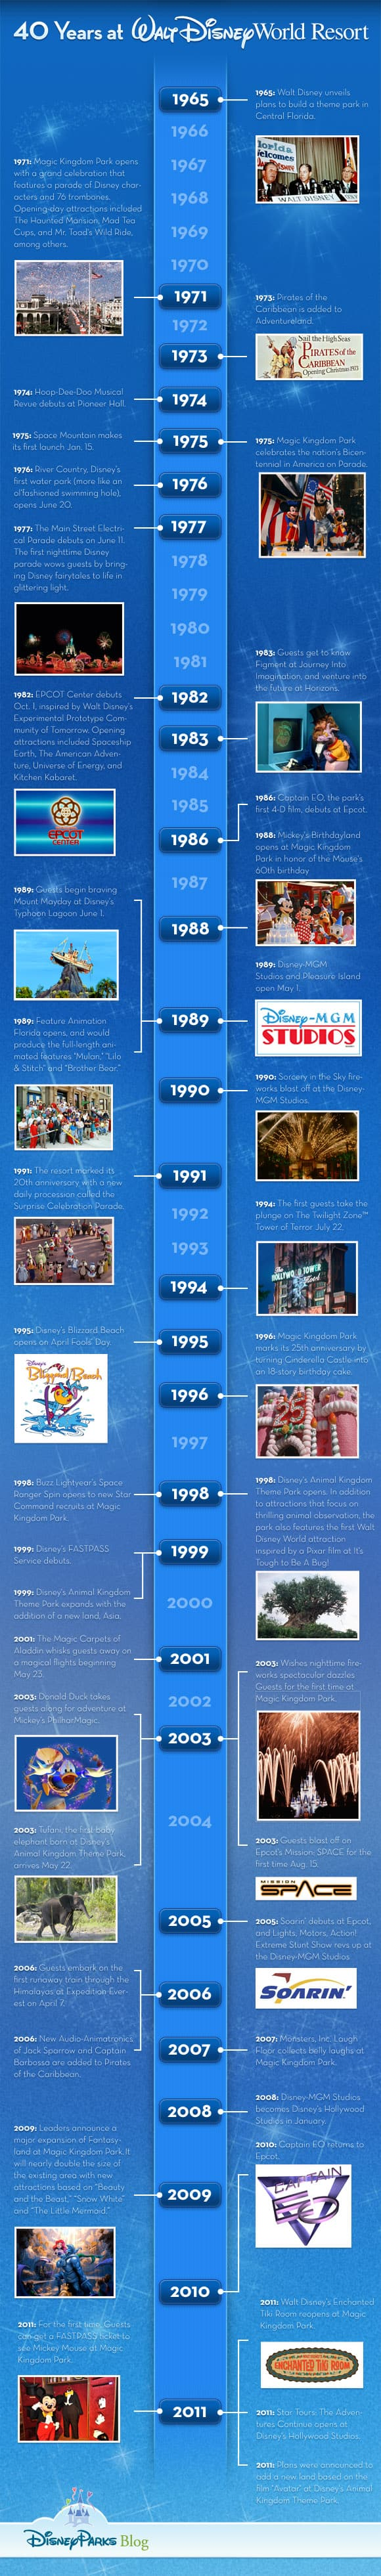 Timeline: Celebrating 40 Years at Walt Disney World Resort